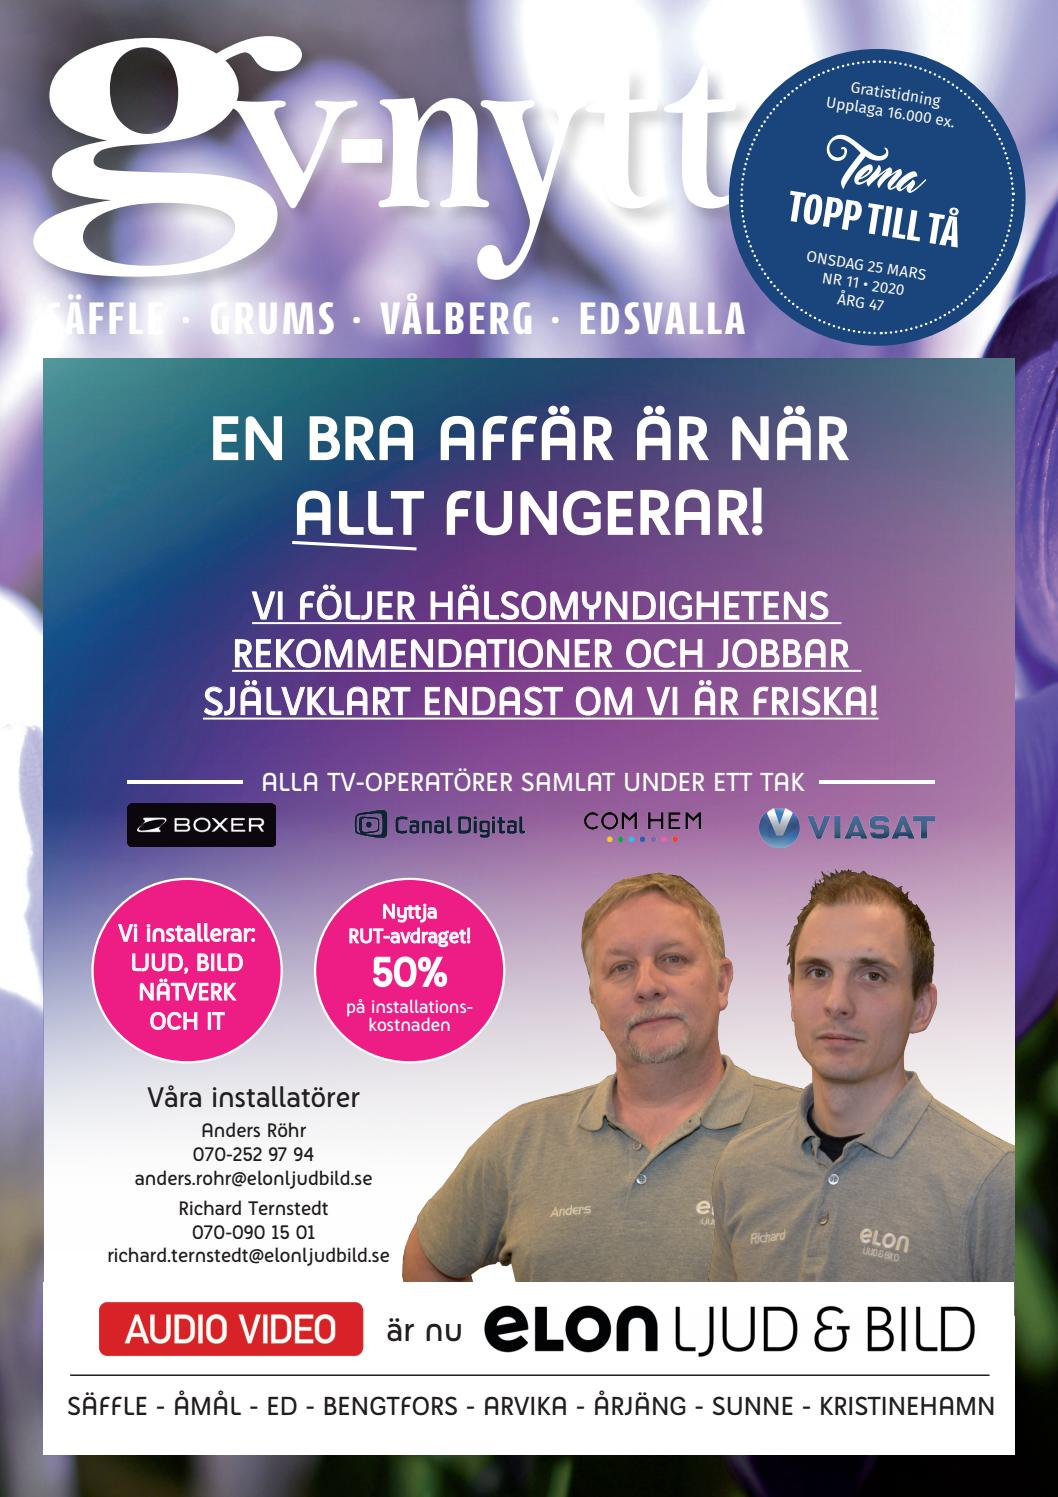 Hyra stuga/semesterhus - Fryksnde - unam.net